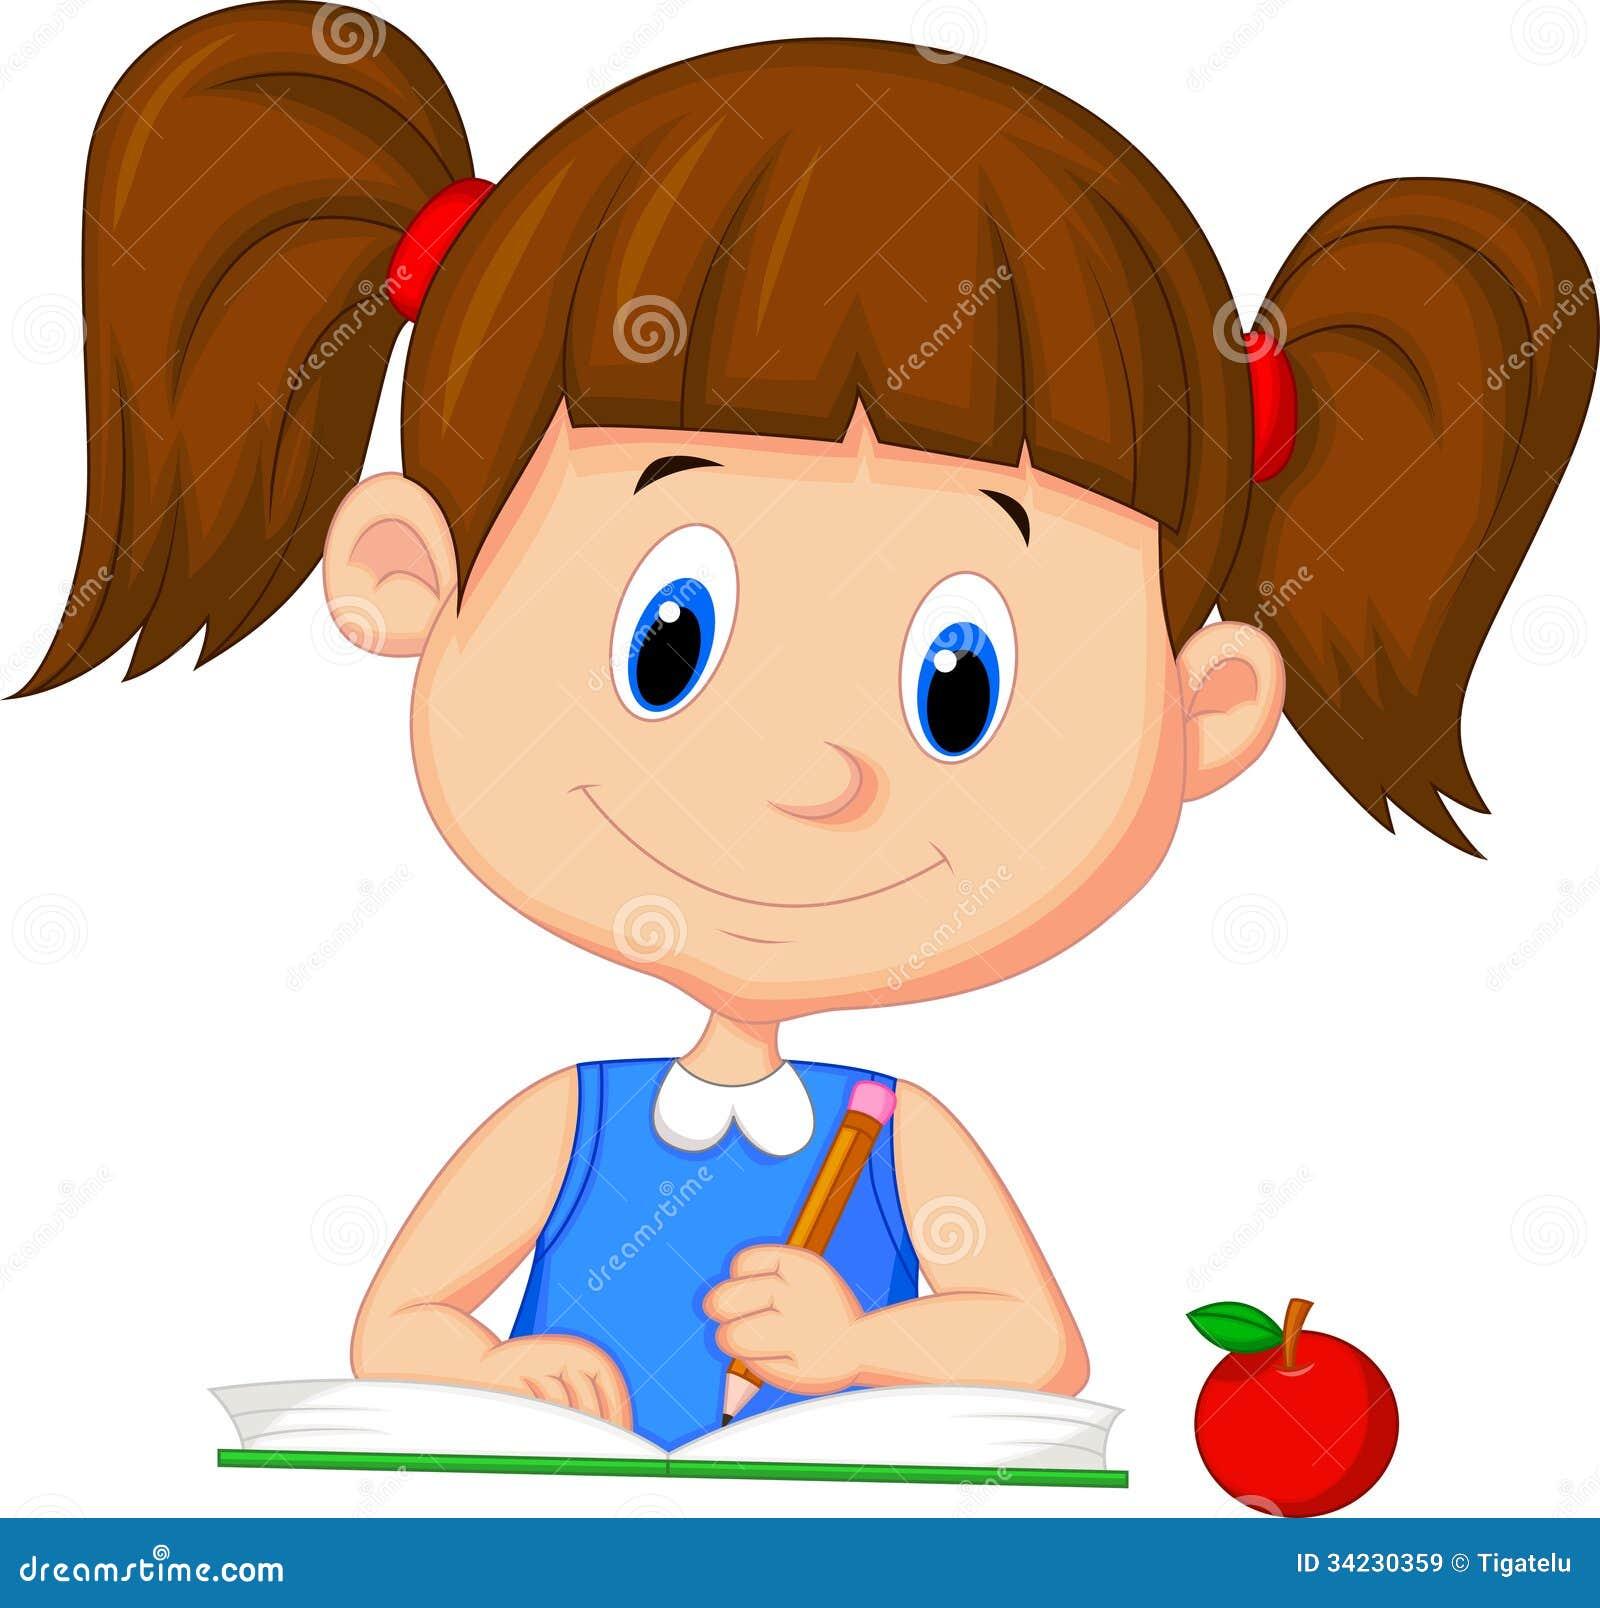 Cute Cartoon Girl Writing On A Book Stock Vector Illustration Of